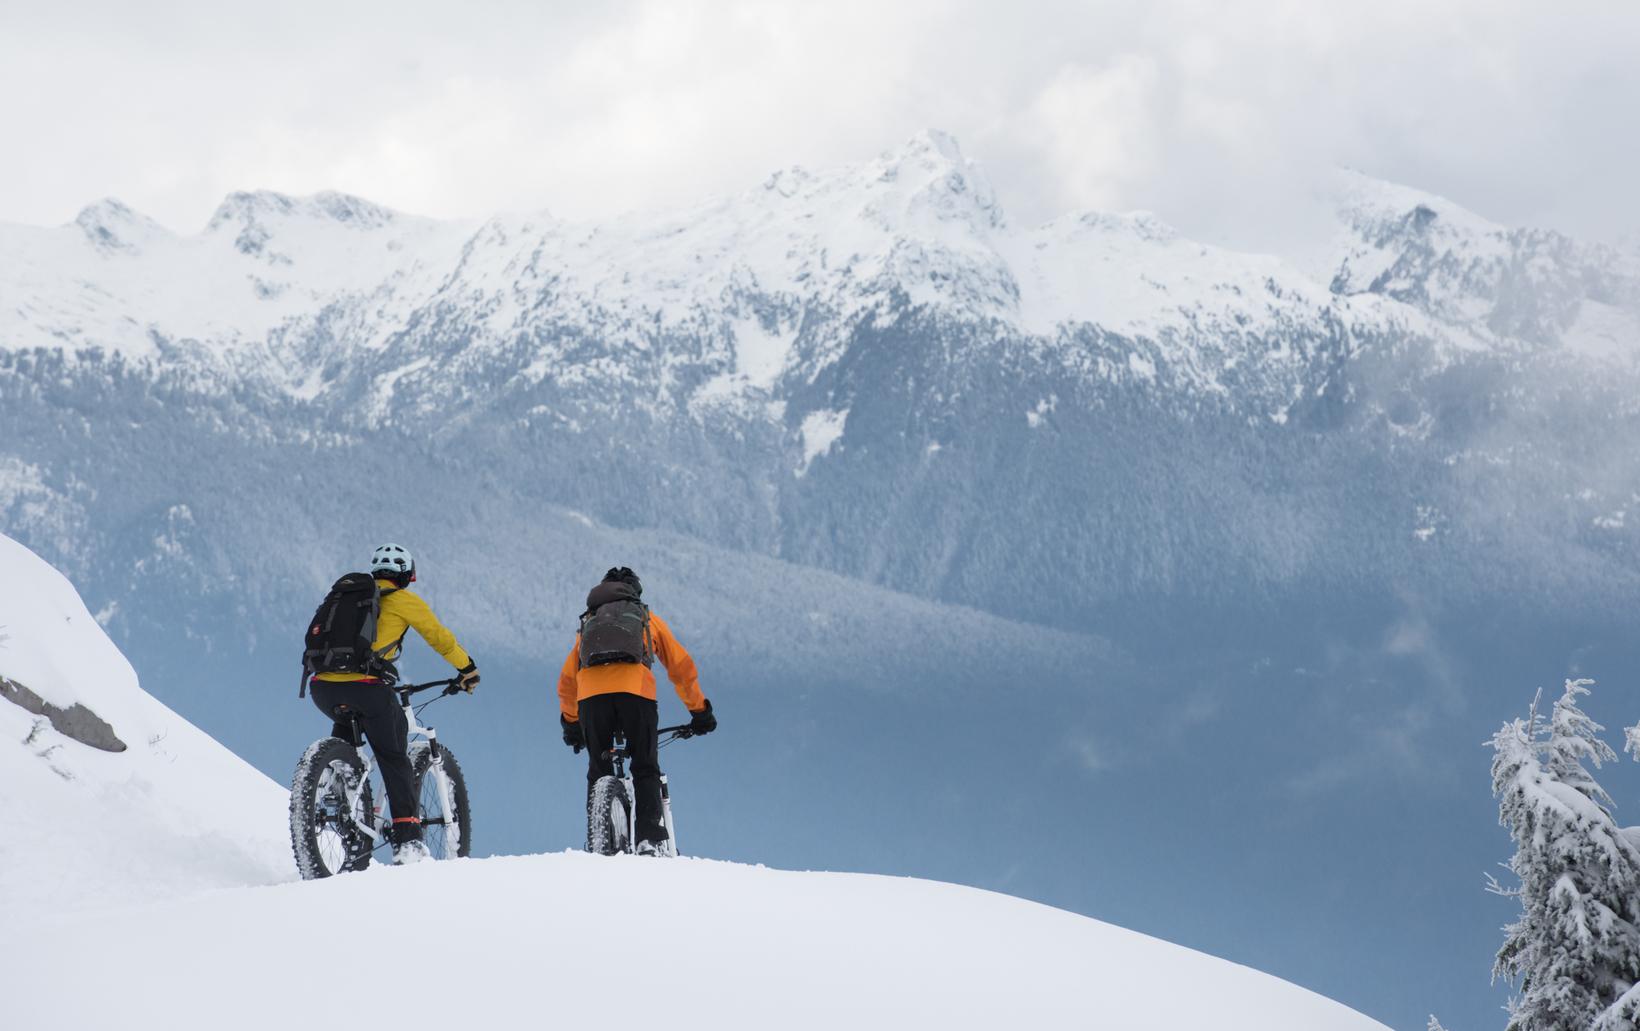 Fat Tire Snow Biking Tours in Squamish